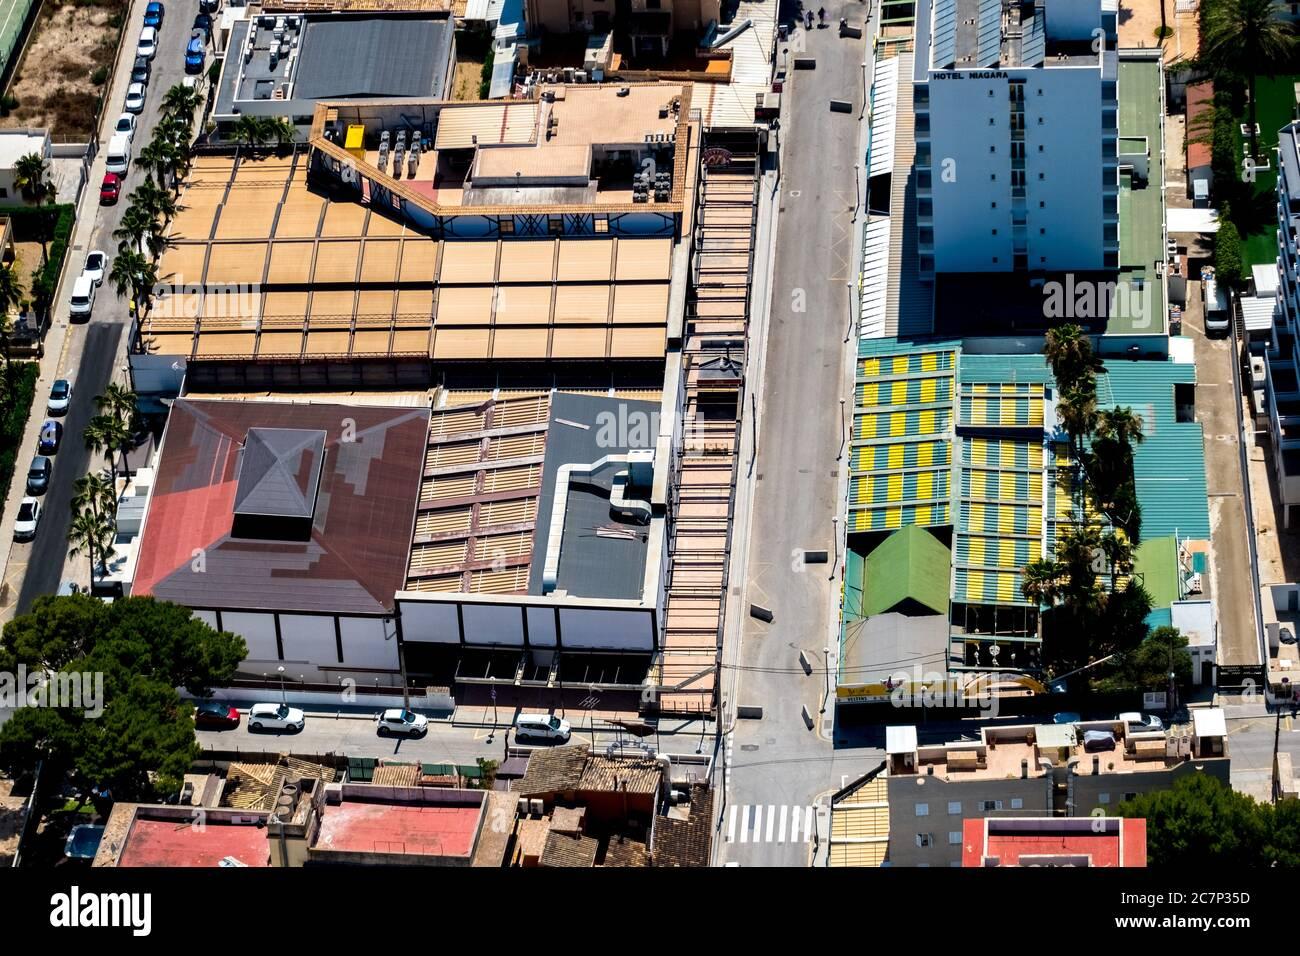 Luftbild, geschlossene große Disco Beer King, Bamboleo, Ham Street, Beer Street, Strand von Arenal mit Balneario 5, Balneario 6, Balneario 5, S'arenal, sind Stockfoto